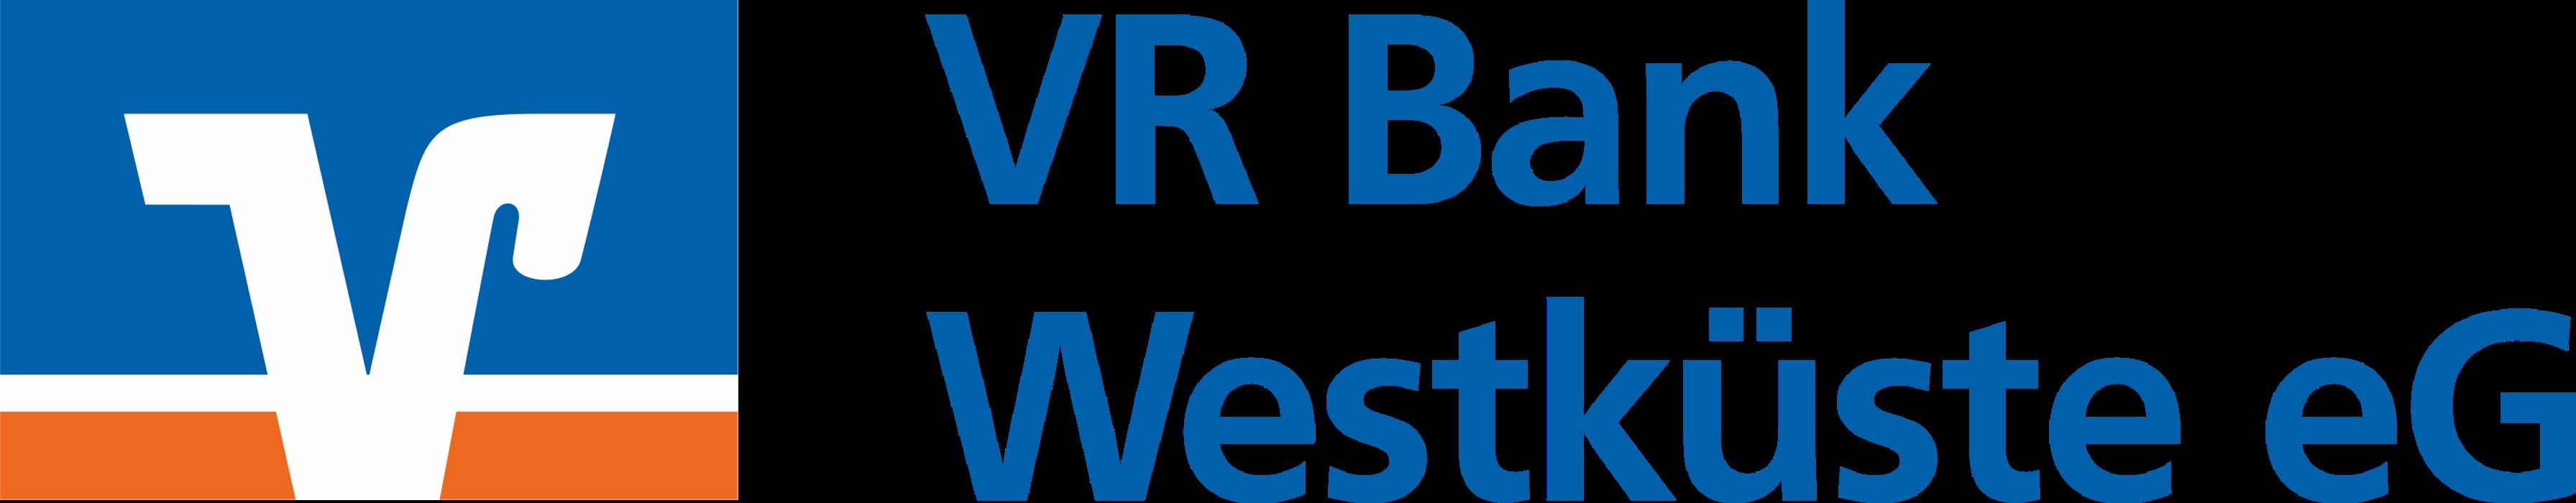 Logo von VR Bank Westküste eG Filiale Tellingstedt